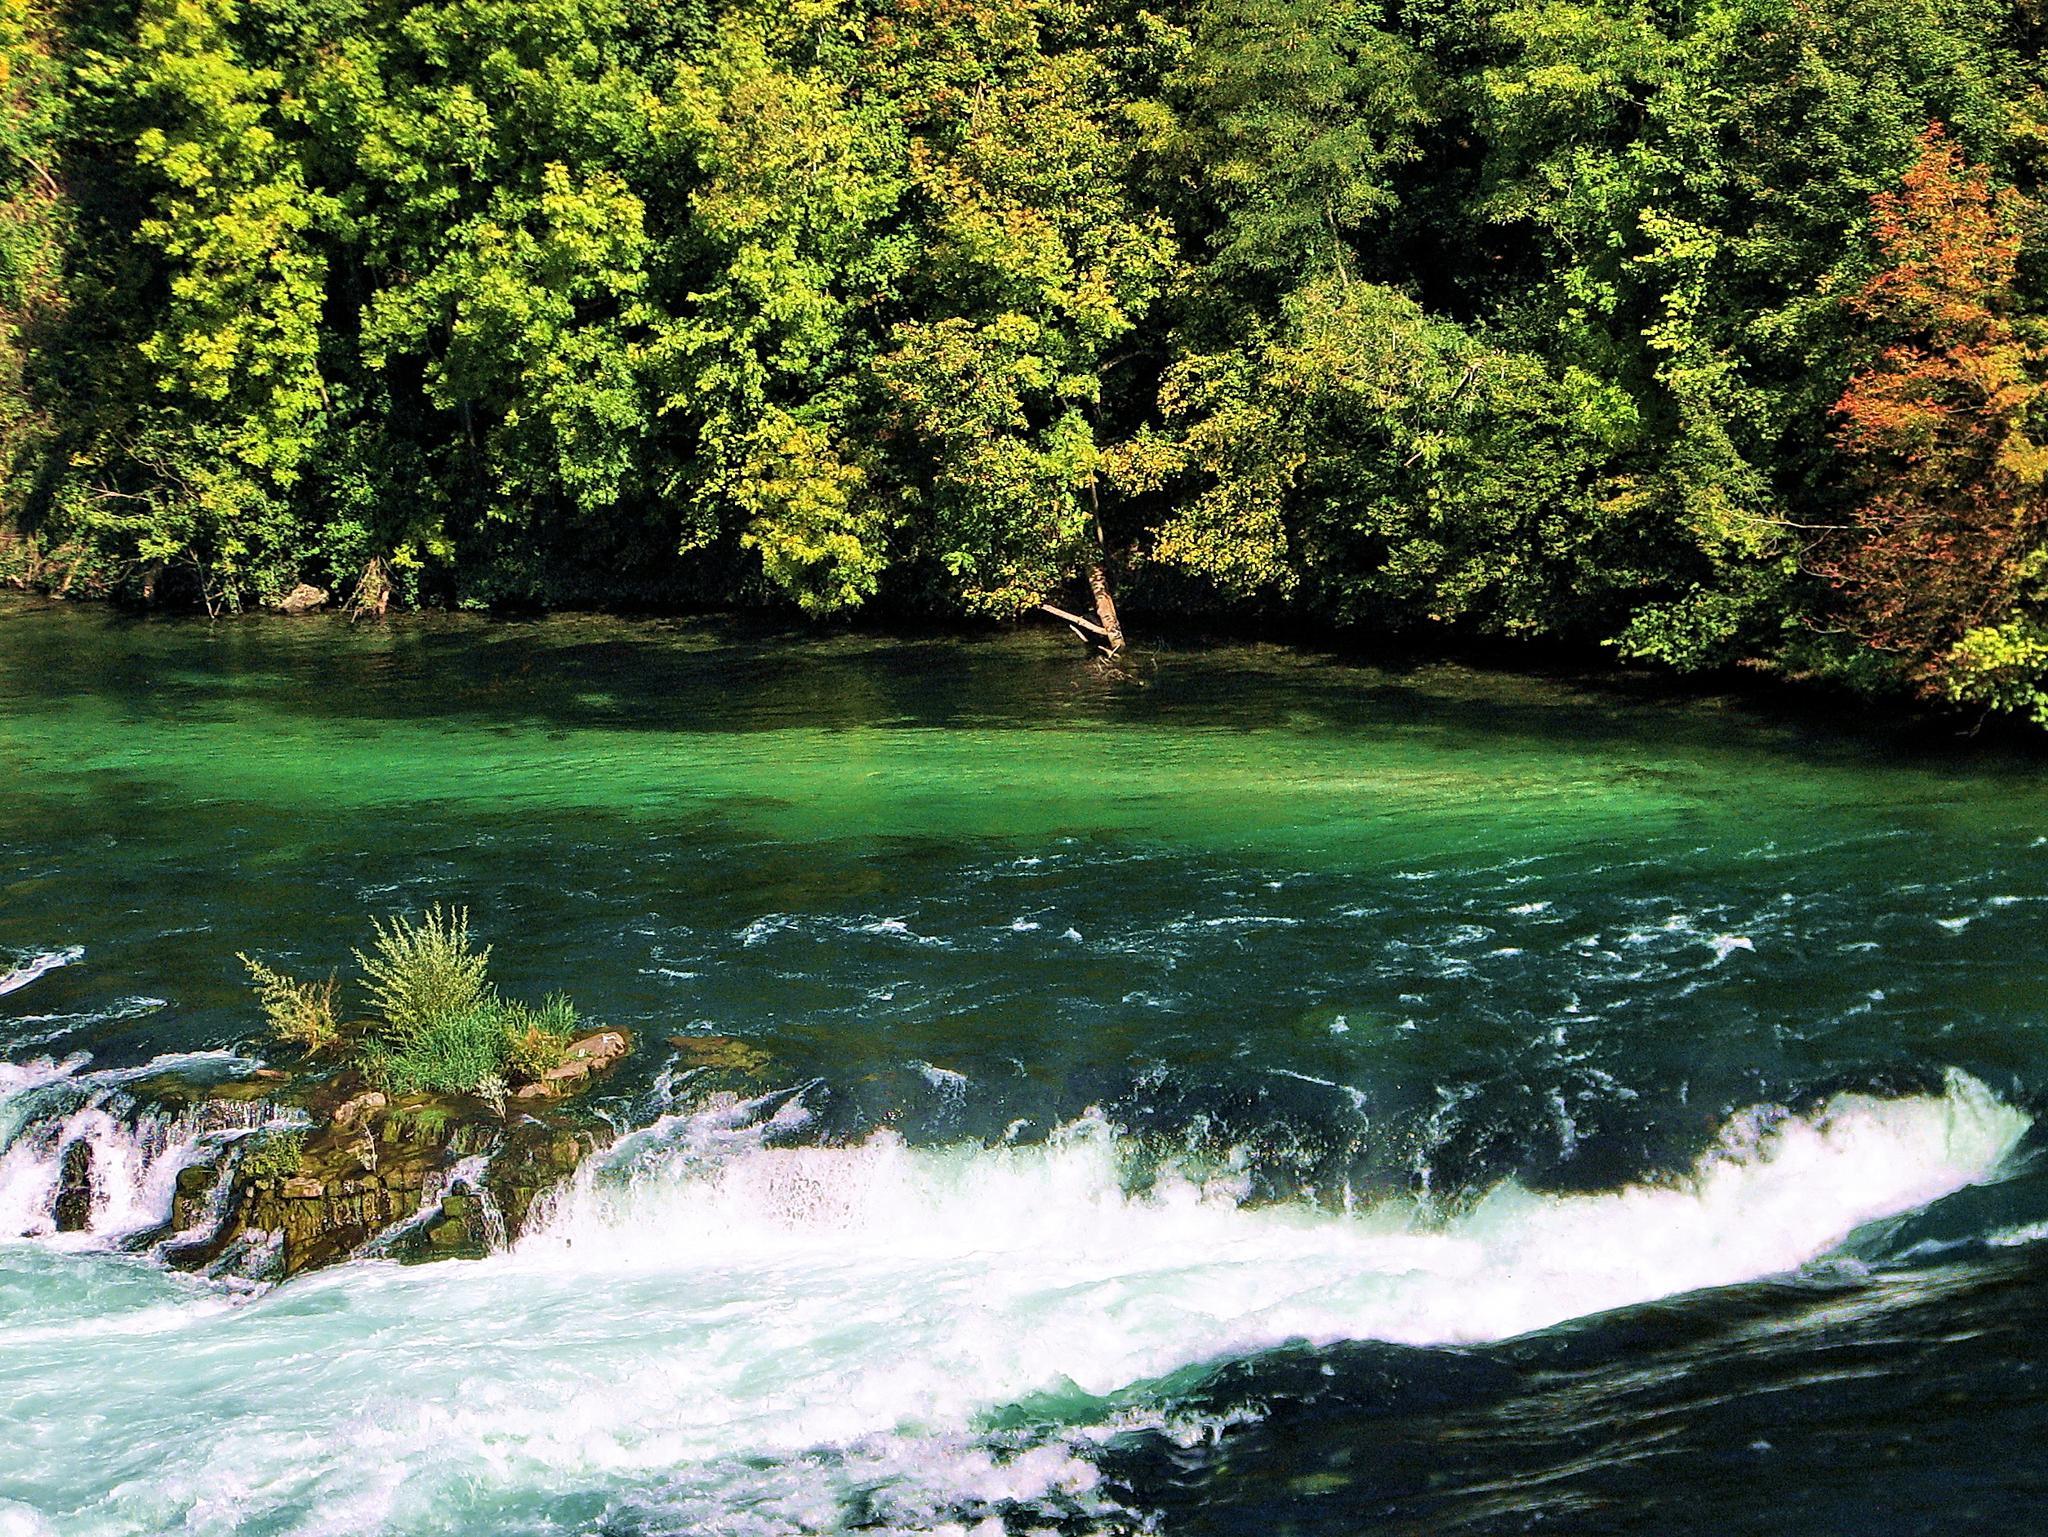 Rhine falls Switzerland by BernardaBizjak